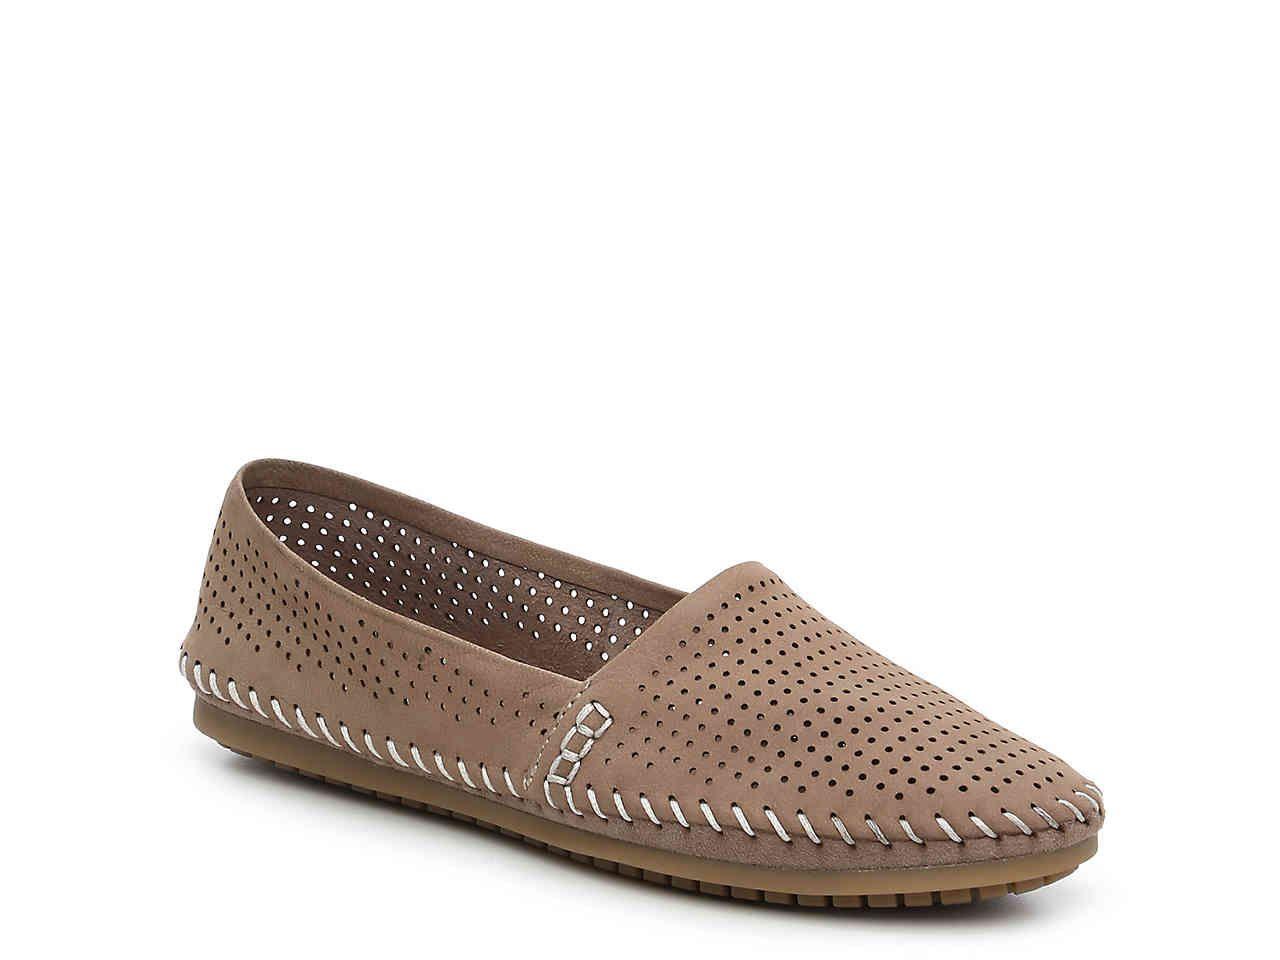 Sand Flat | Shoes, Women shoes